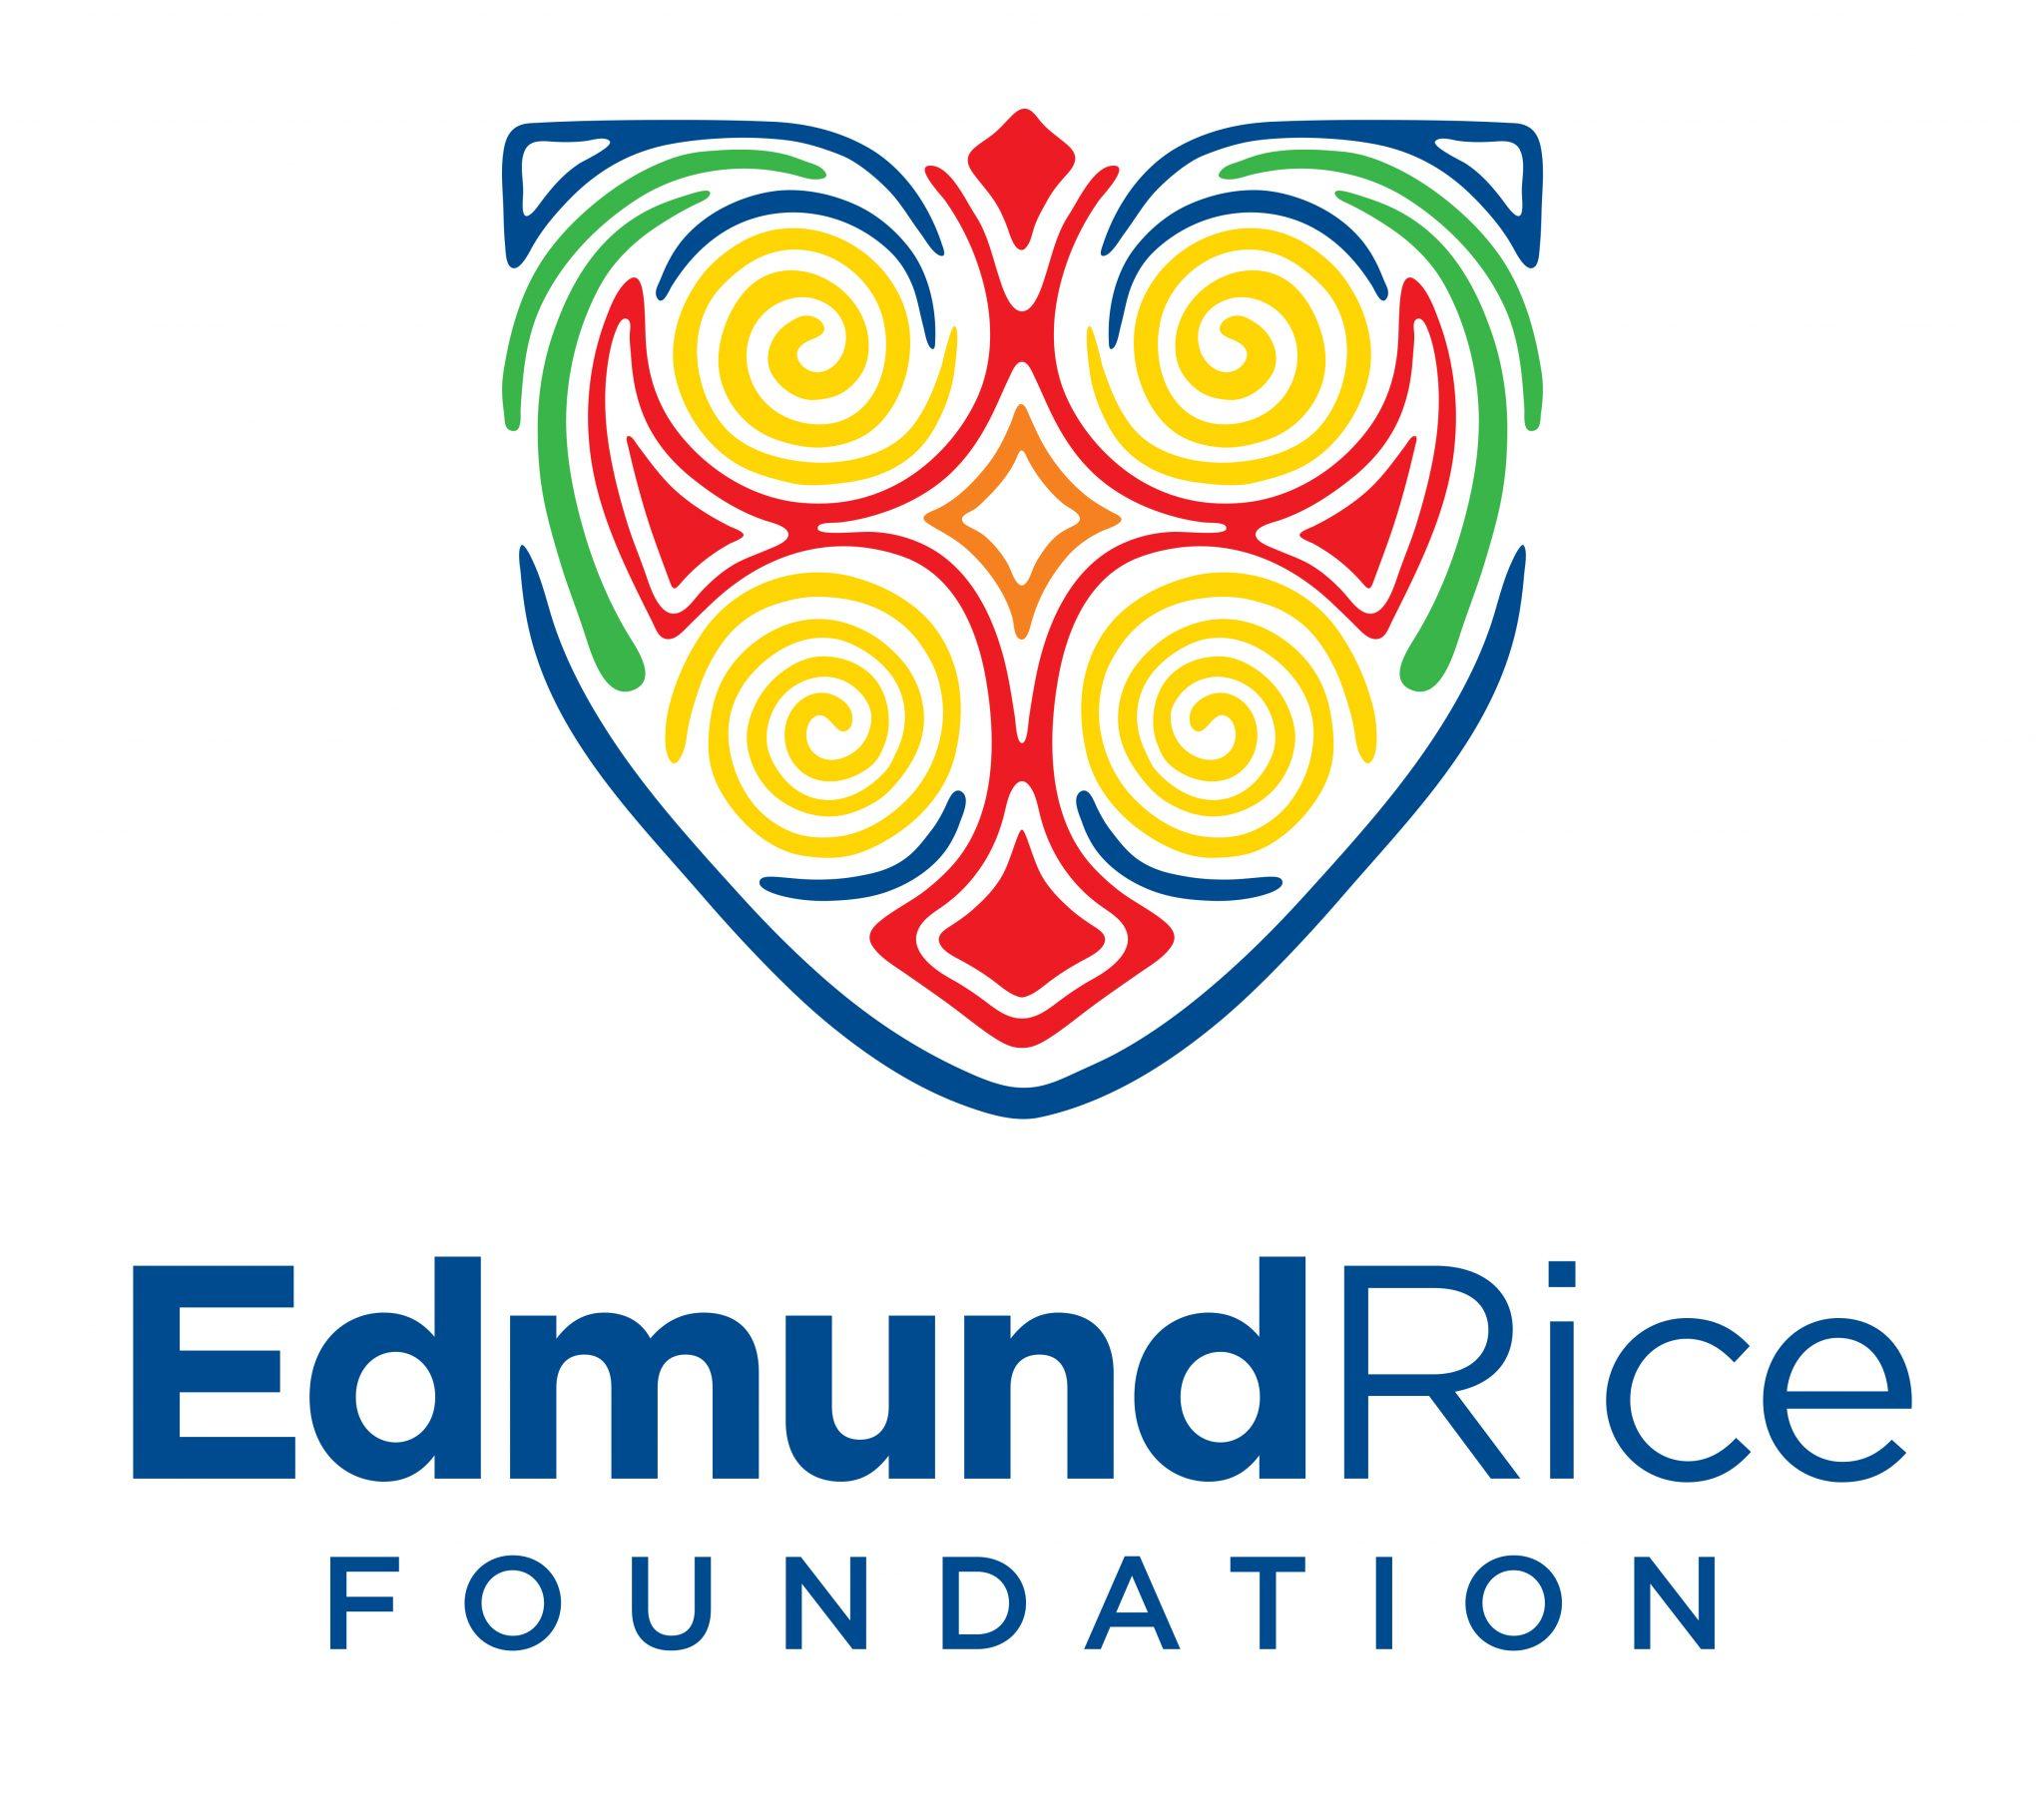 Edmund Rice Foundation | Agnes Madeleine Floriet Creative Arts Wing